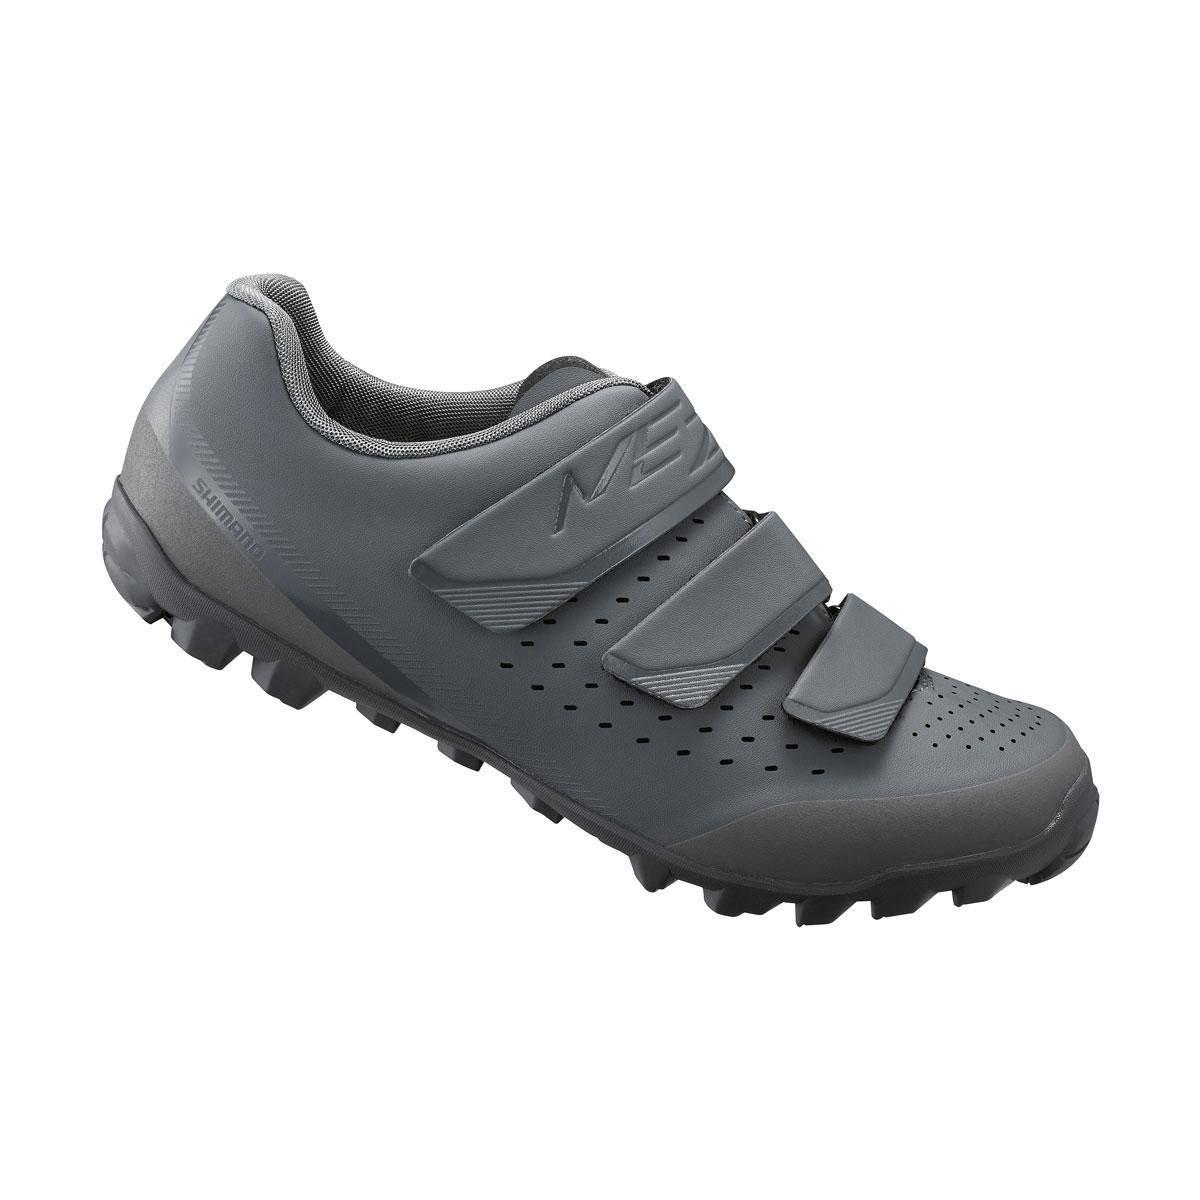 Shimano MTB obuv SH-ME201WG, šedá, 36